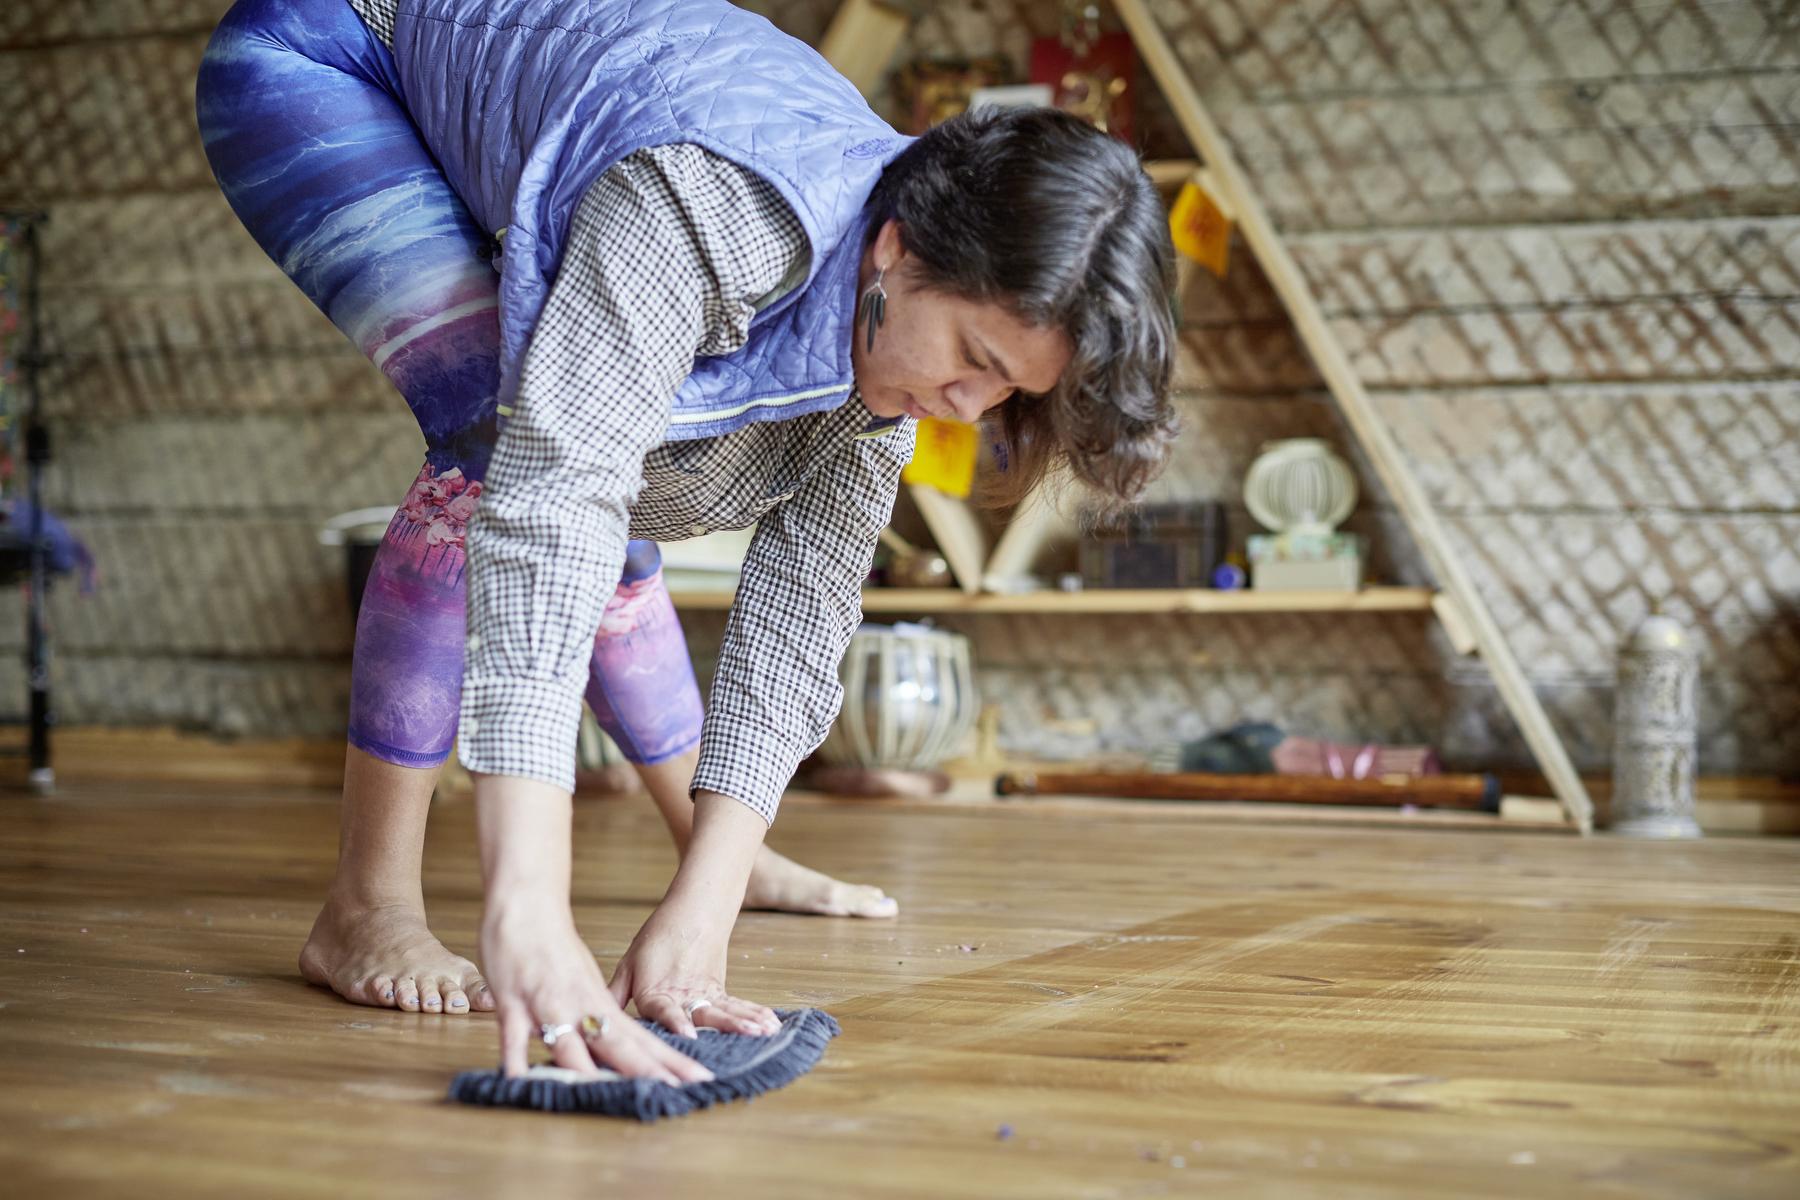 Shanti Dom Weißrussland Yogaausbildung Savanada Yoga August 2020